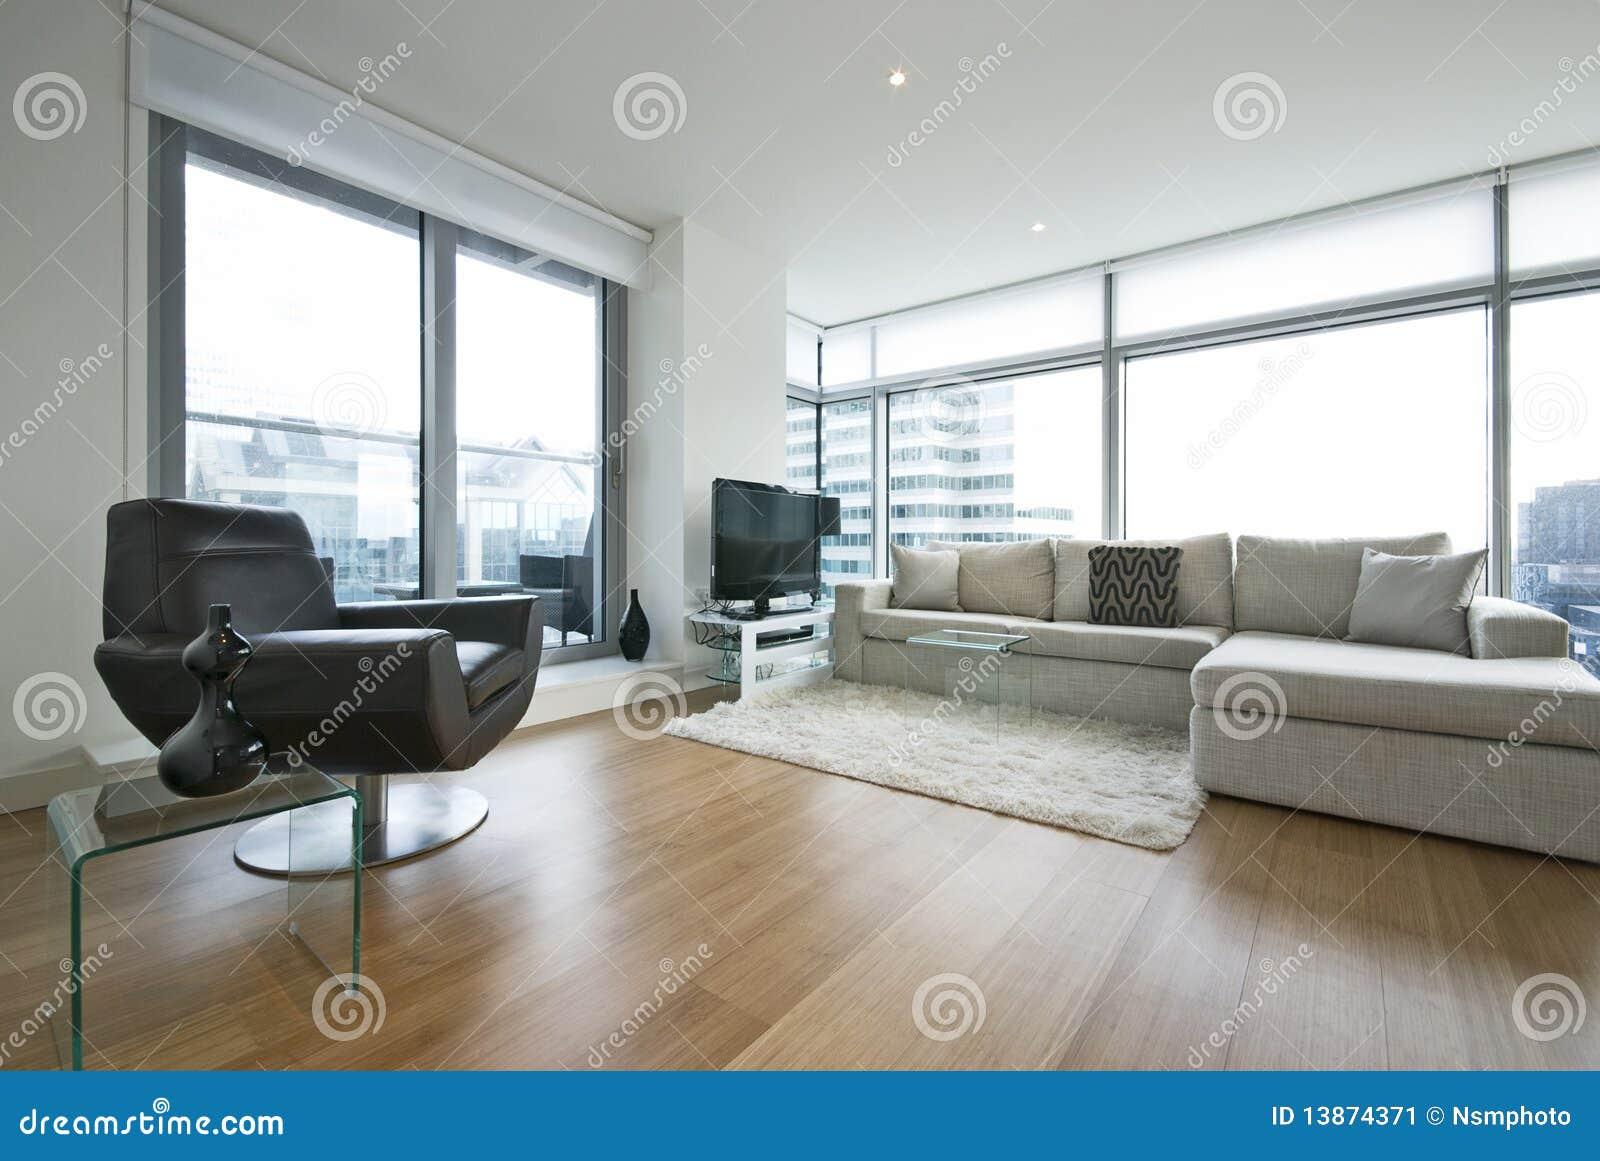 Eigentijdse woonkamer met ontwerpermeubilair stock afbeelding